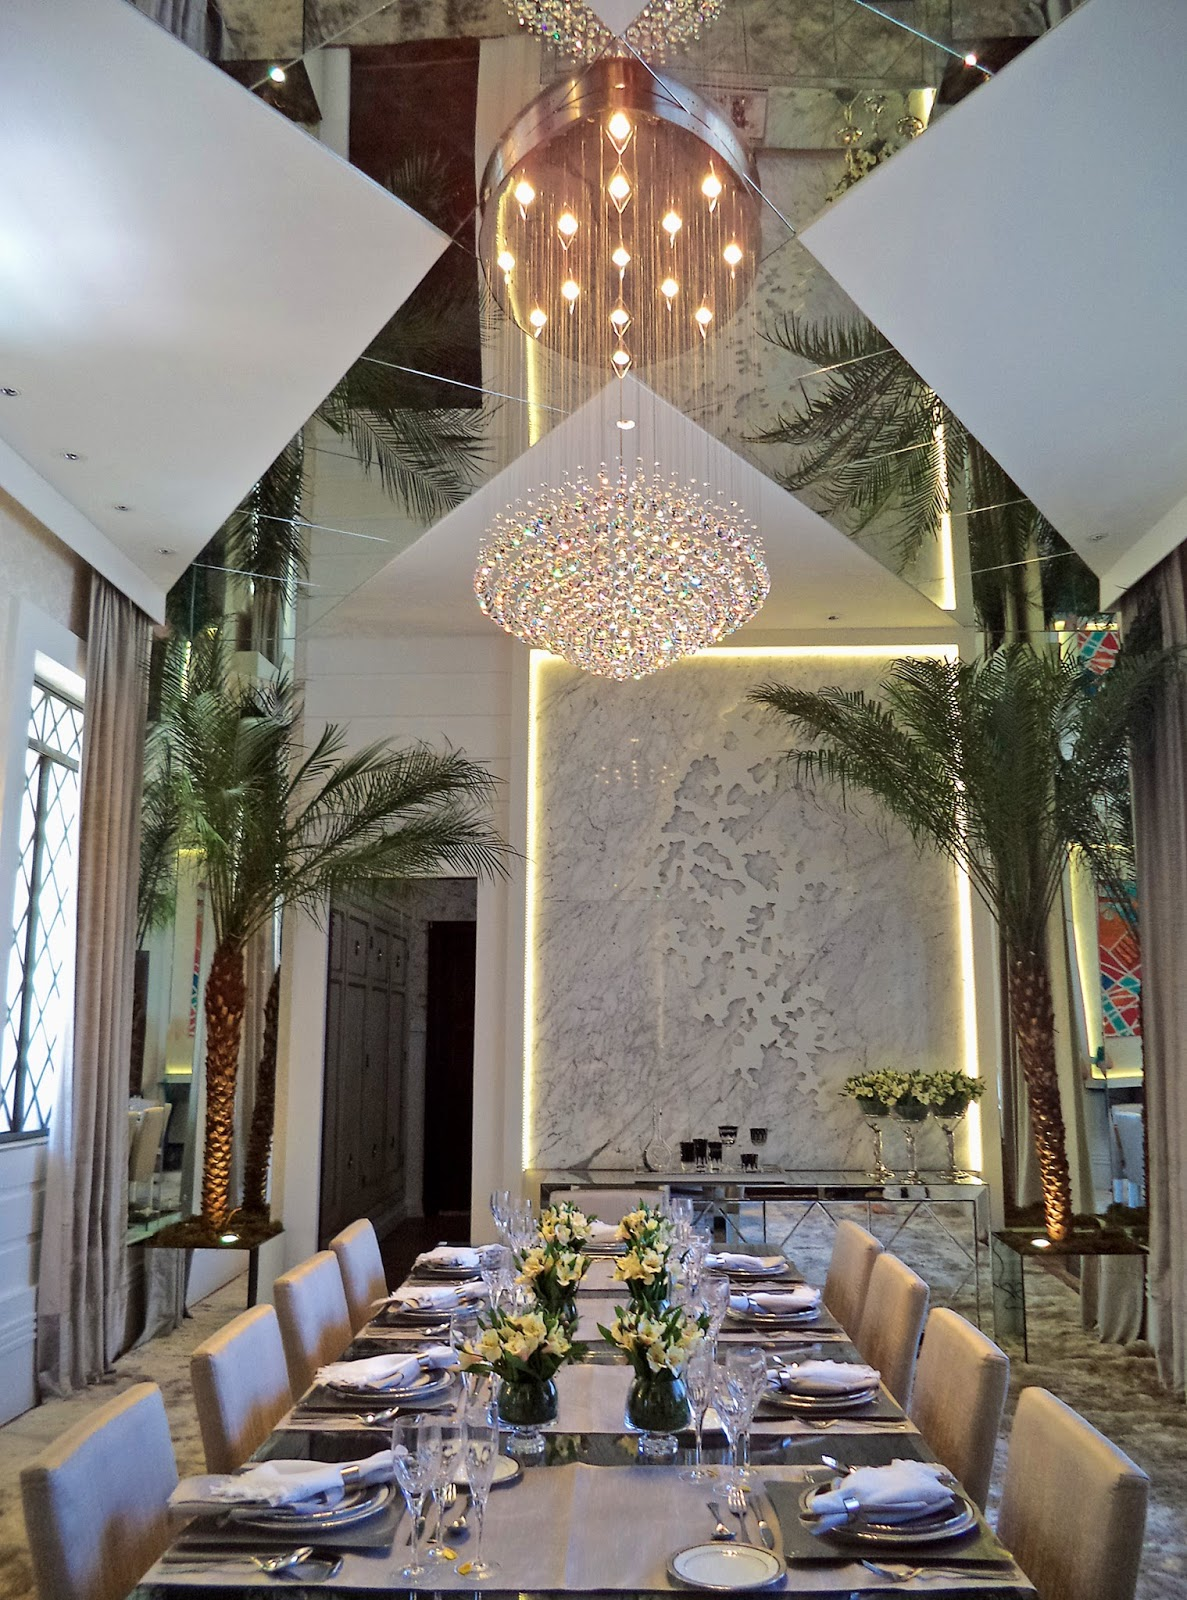 Sala De Jantar Iara Kilaris ~  de interiores Iara Kílaris projeta sala de jantar digna dos grandes